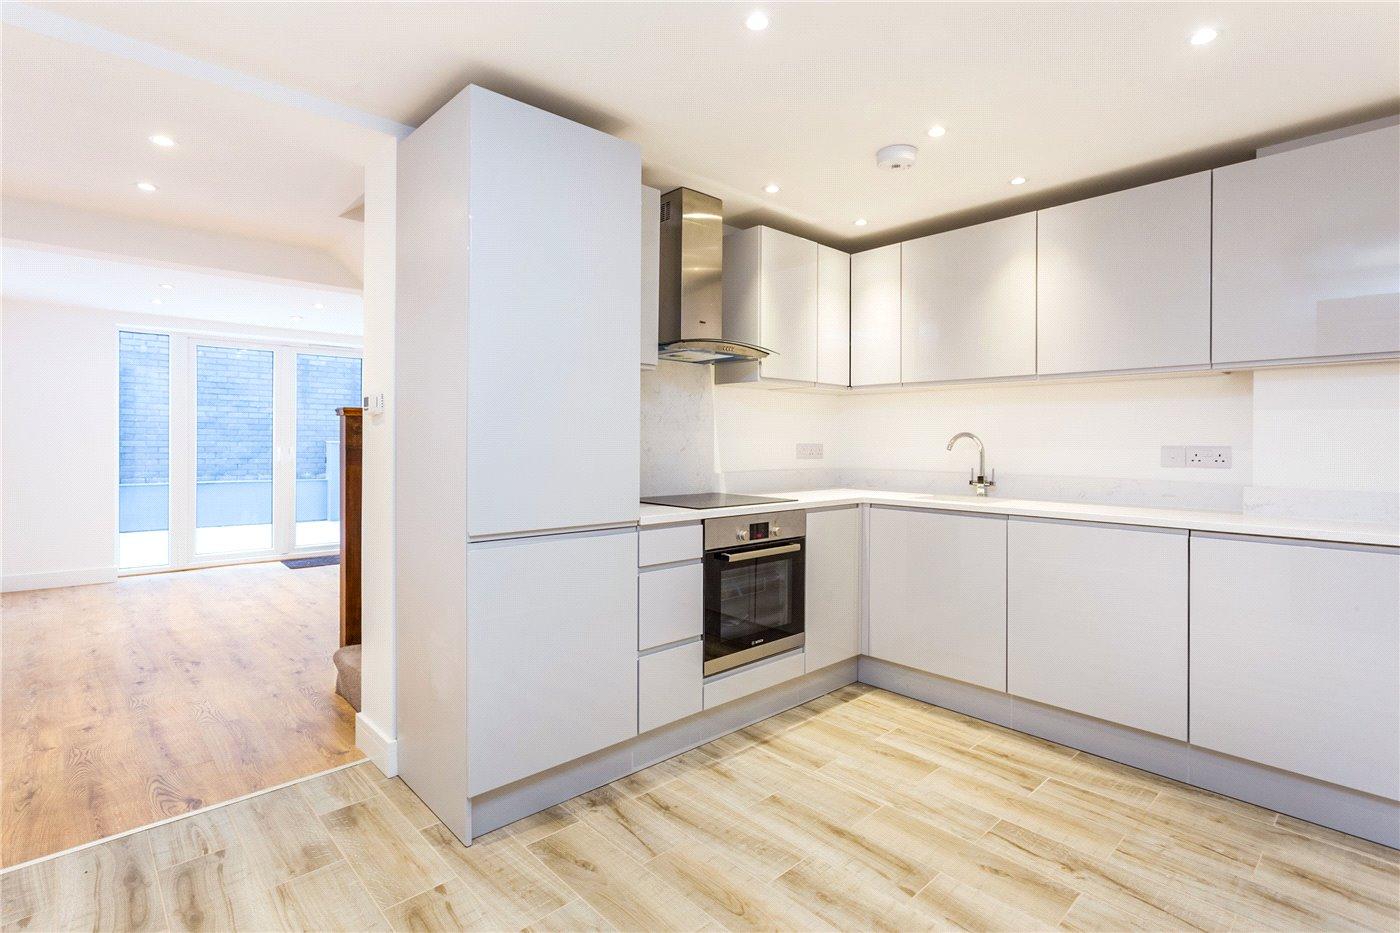 1 bedroom property for sale in Hackney Road, London, E2 - £500,000